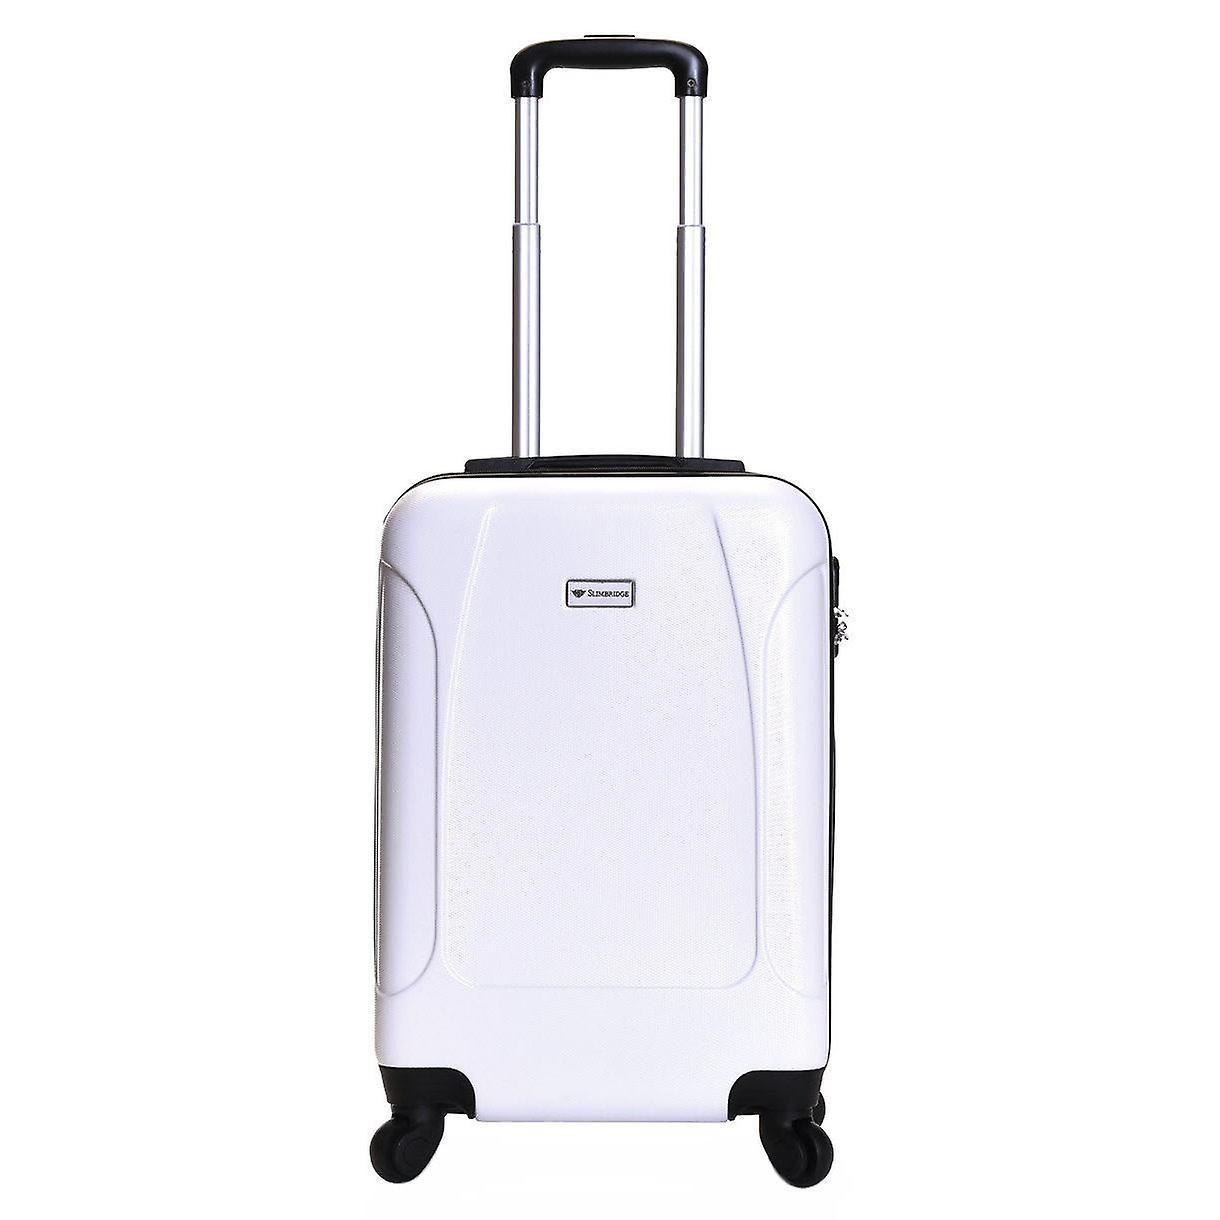 Slimbridge Alameda 55 cm Hard Suitcase, Pearl White